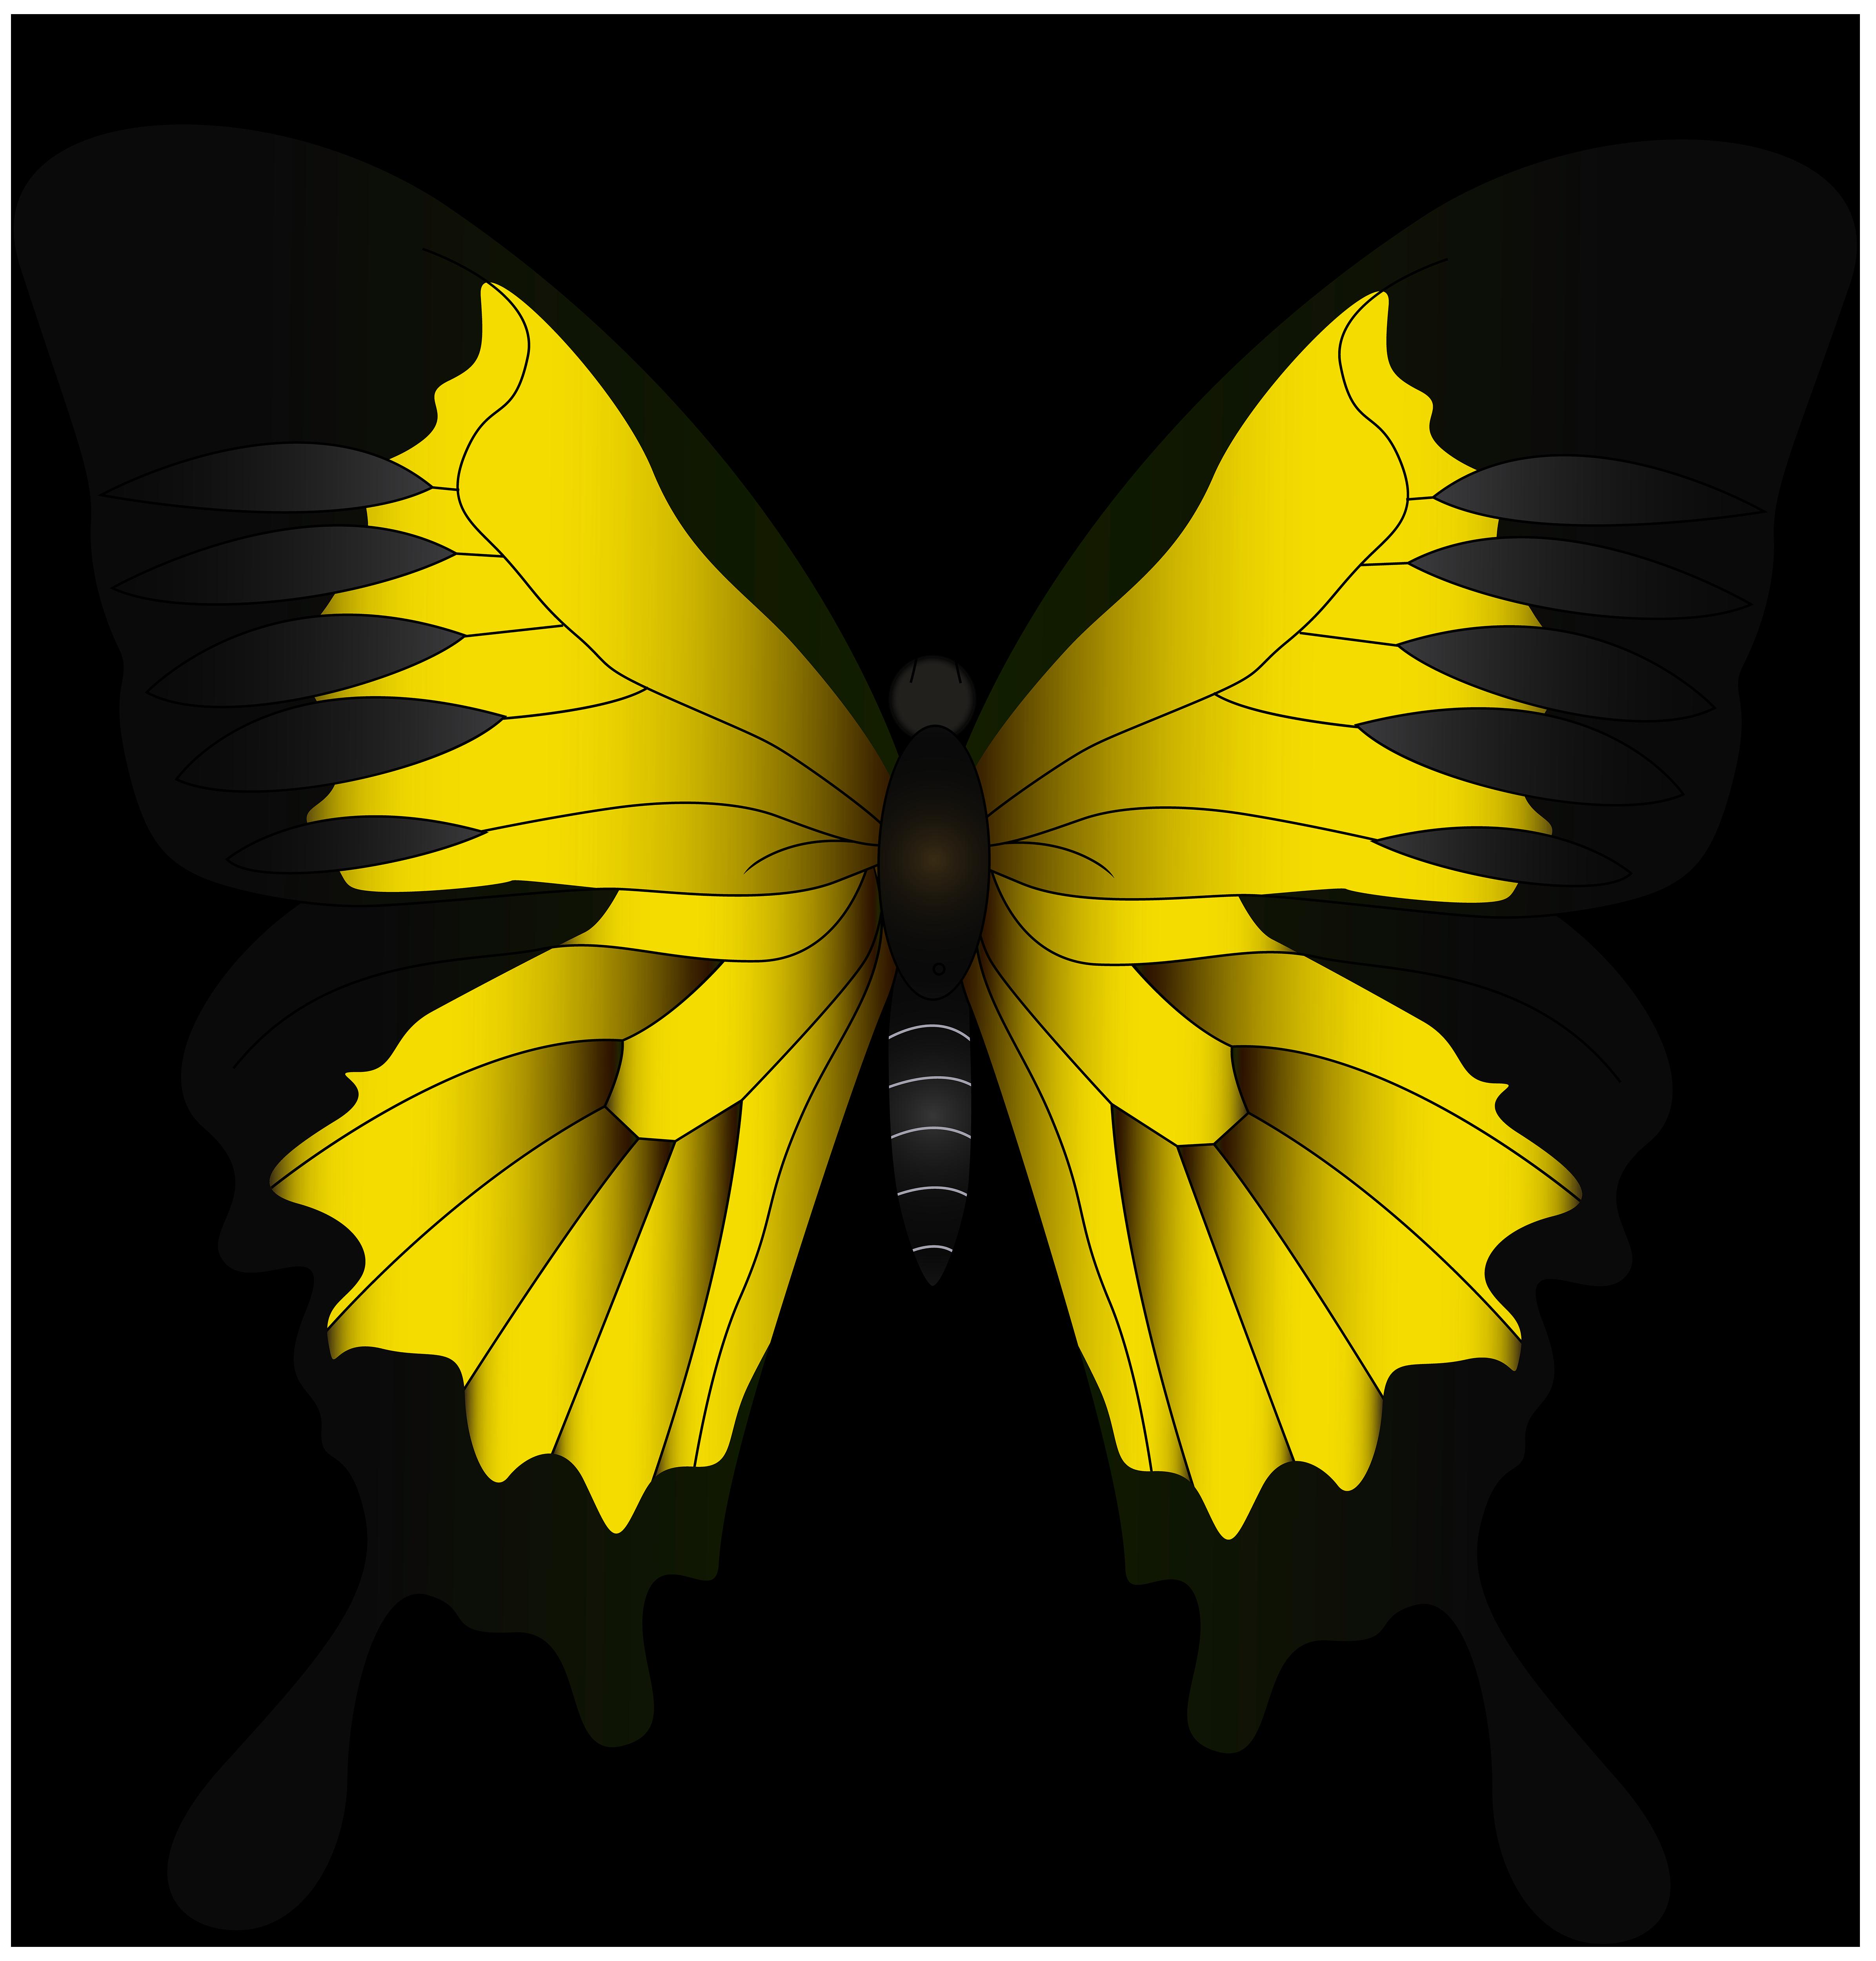 Pineapple clipart symmetrical. Monarch butterfly green yellow